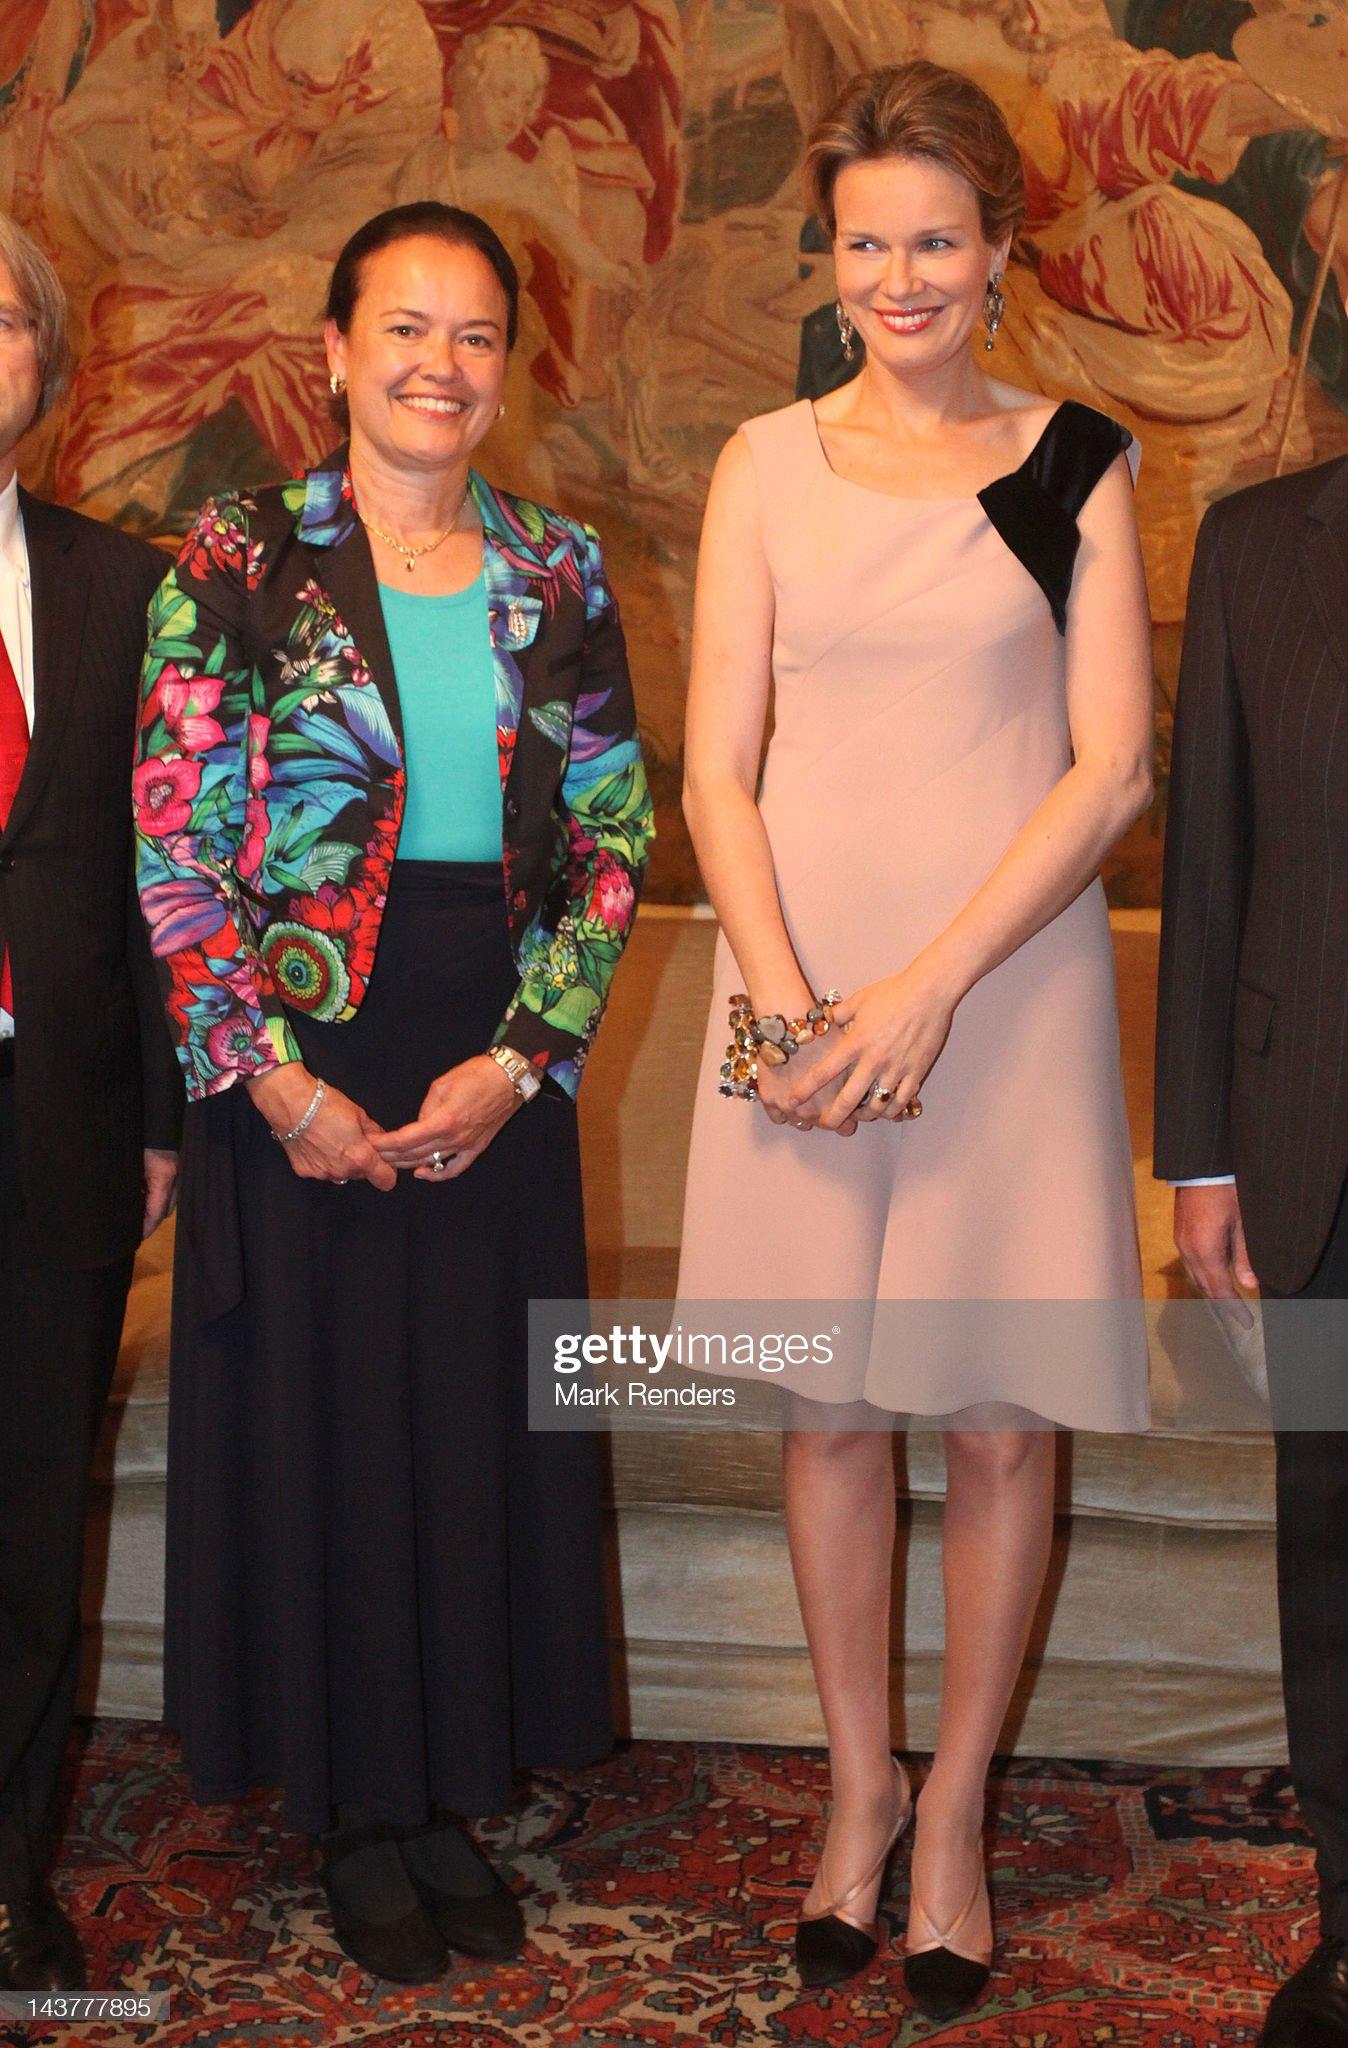 Вечерние наряды Королевы Матильды Princess Mathilde Of Belgium Attends Breast International Gala Dinner : News Photo